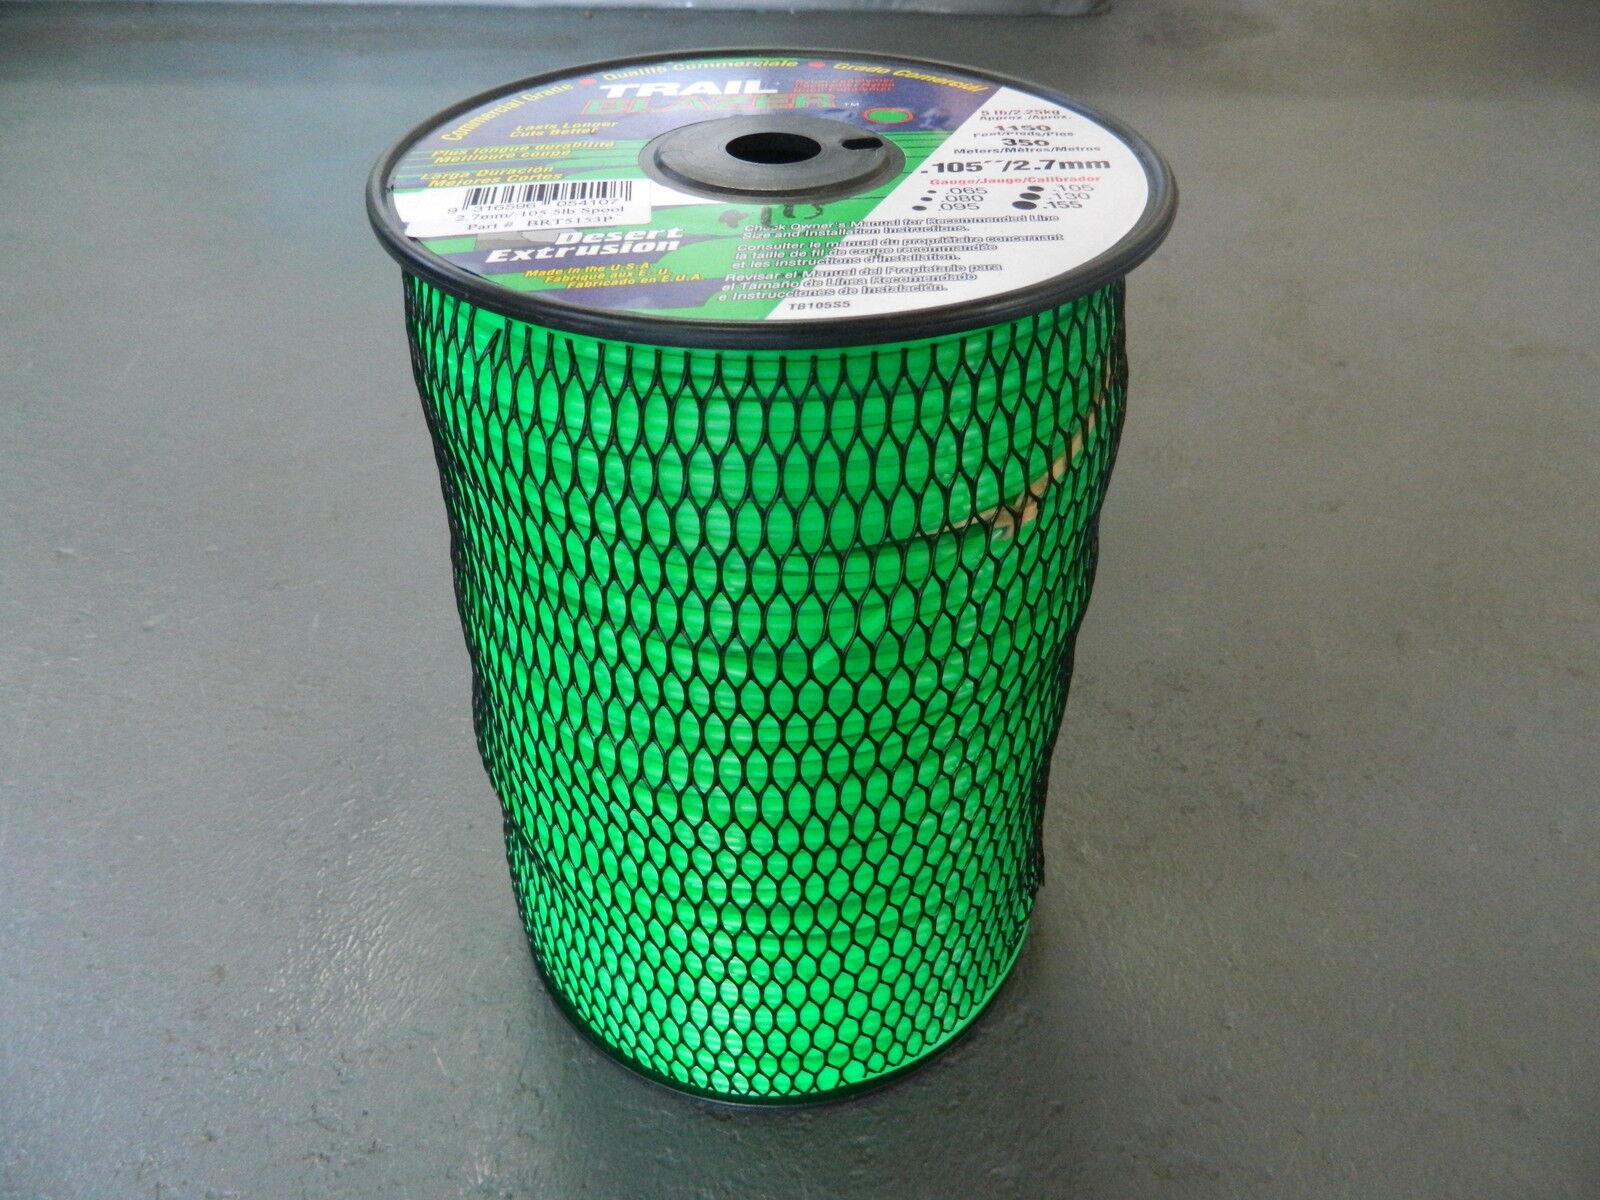 Trail Blazer Nylon Copolymer Trimmer Cord 62